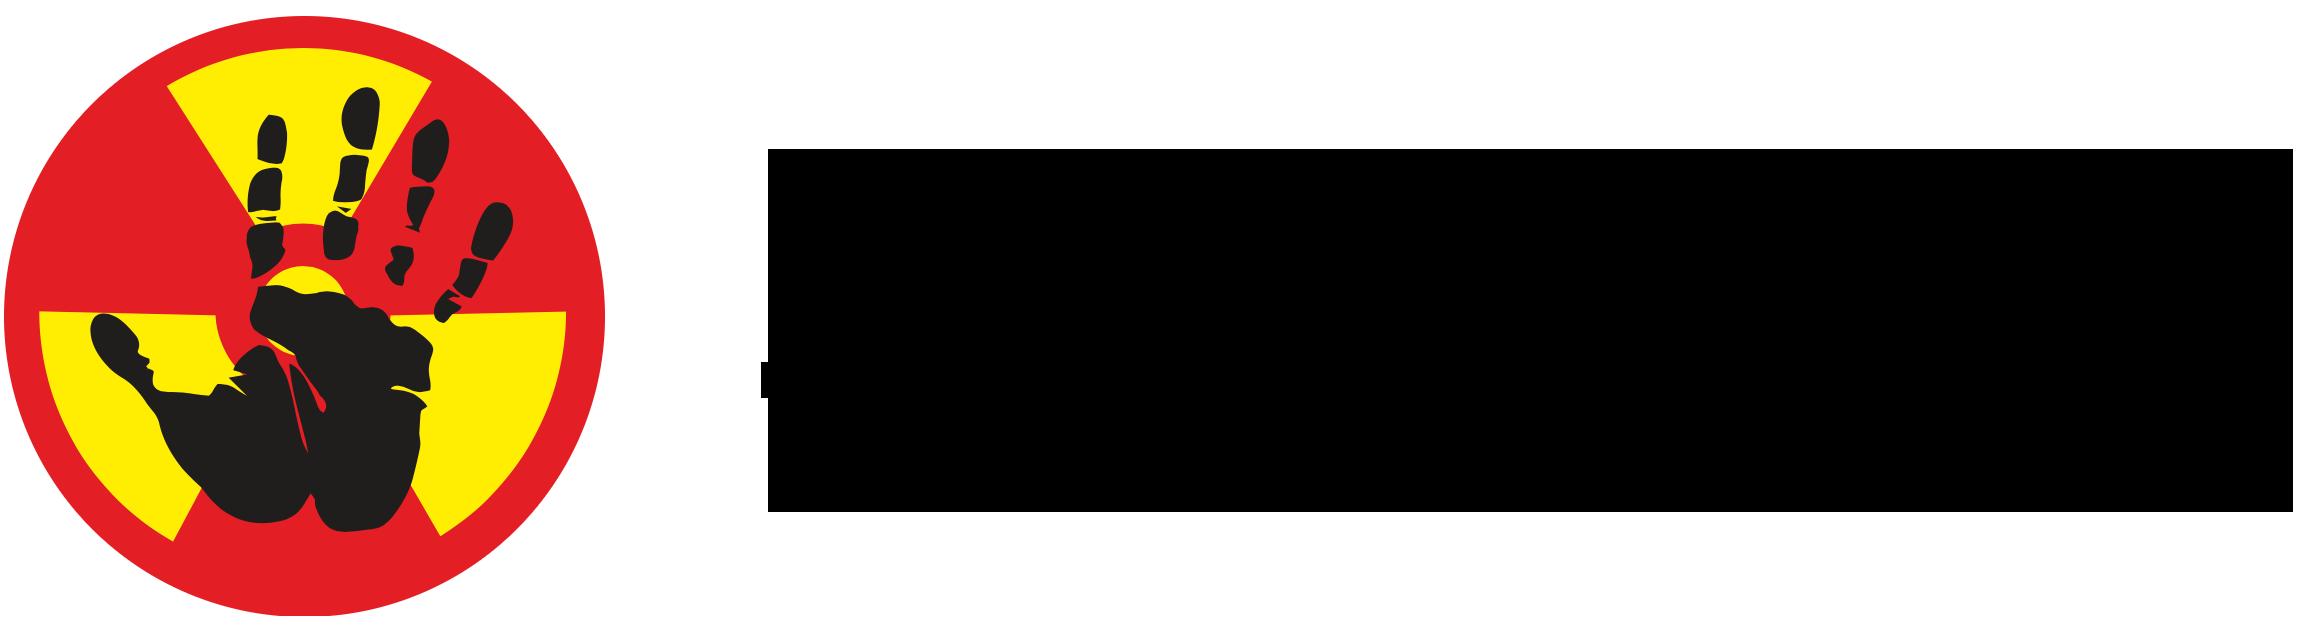 Logo Don't nuke the climate